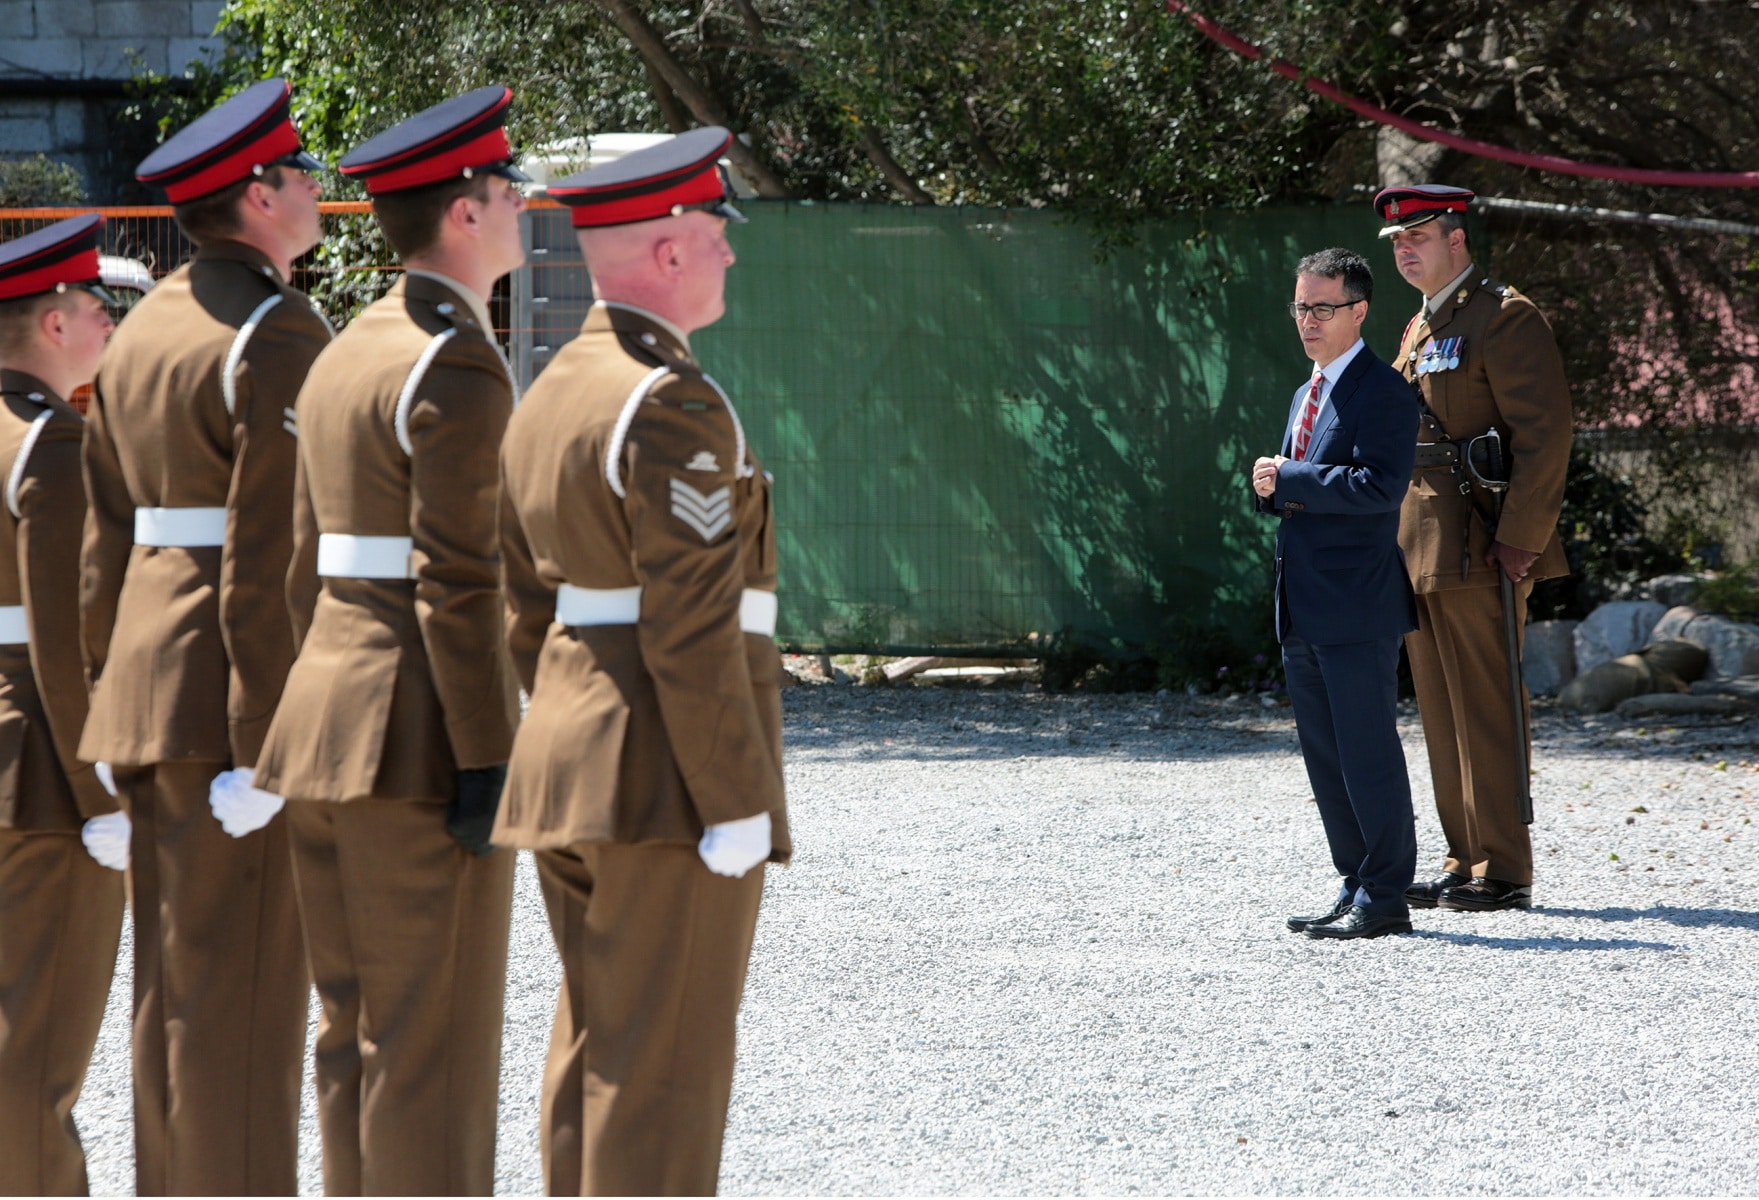 2-jun-2016-salvas-en-gibraltar-honor-al-aniversario-de-coronacin-de-la-reina_26808902224_o